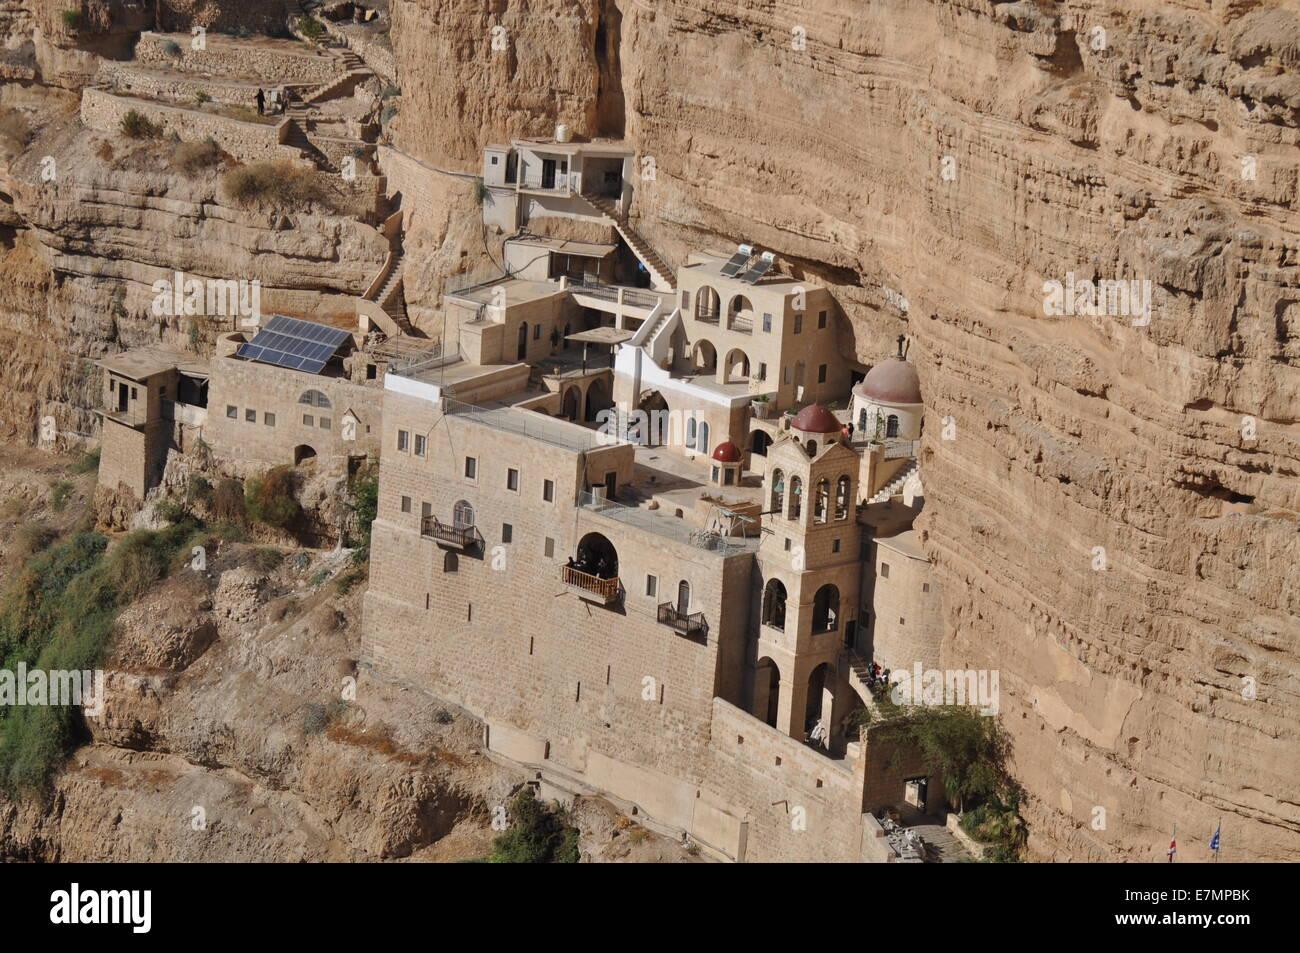 St. George's Monastery in Wadi Qelt near Jericho, Palestine - Stock Image